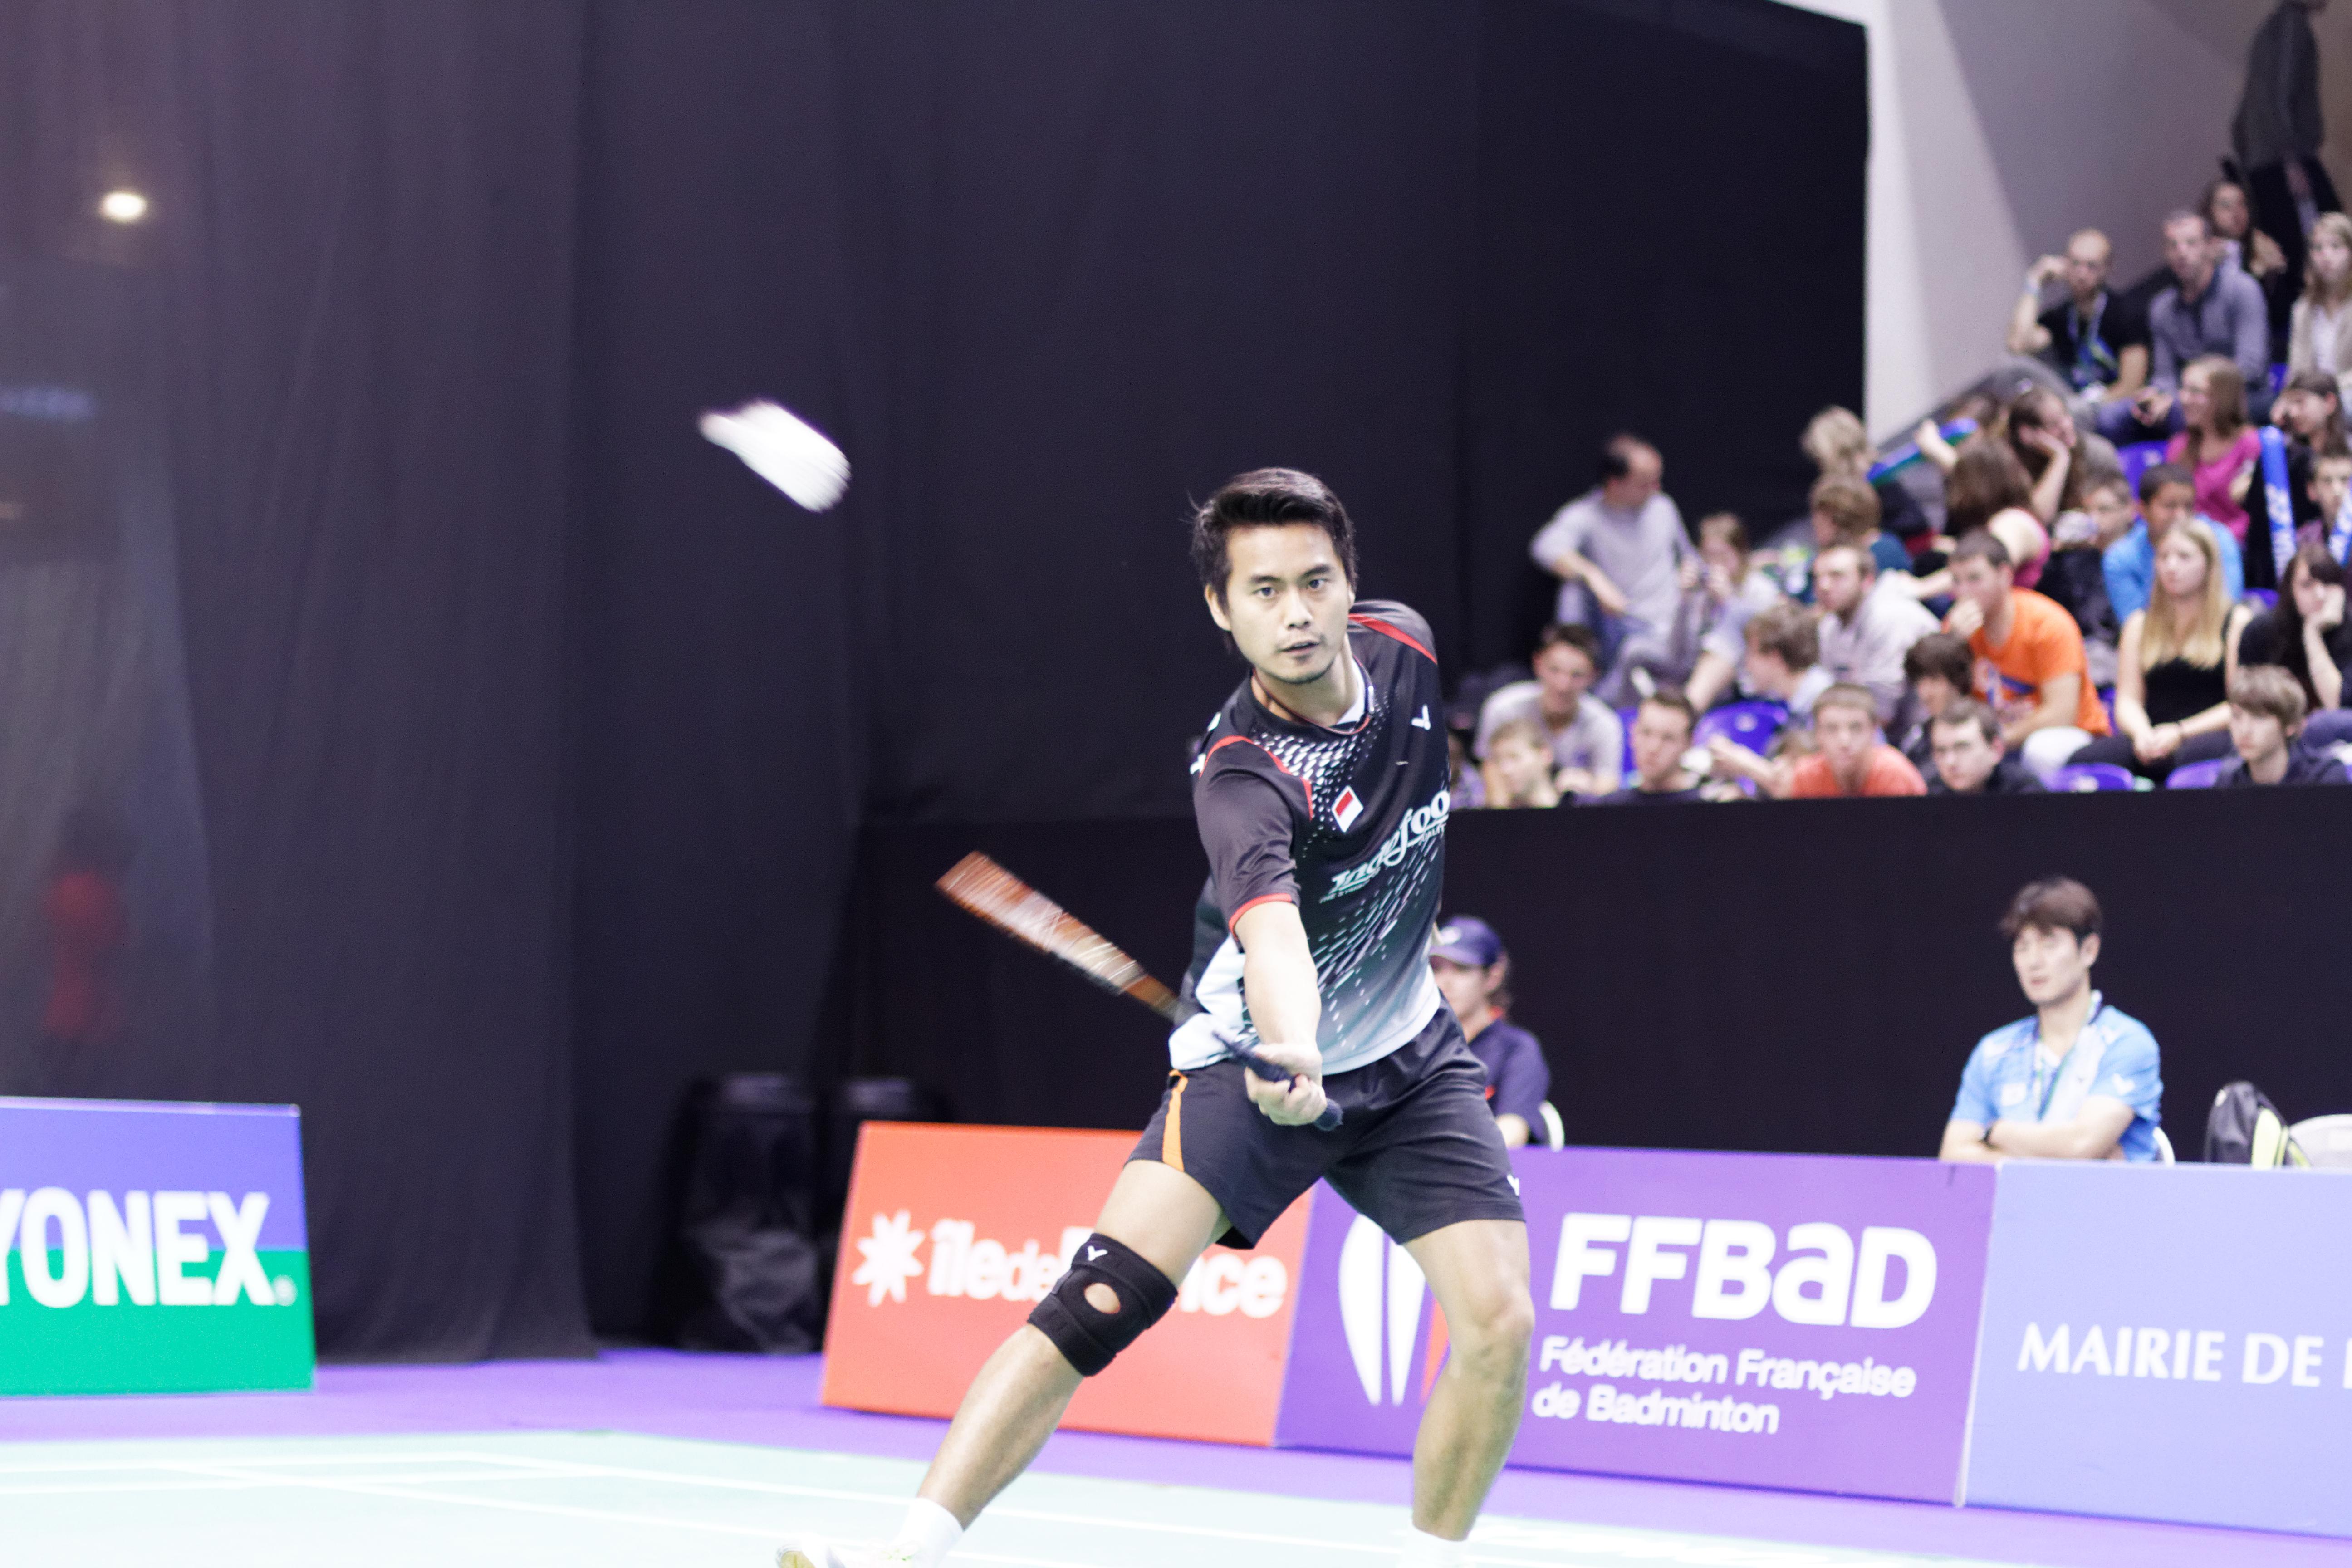 File Yonex IFB 2013 Eightfinal Tantowi Ahmad Lilyana Natsir